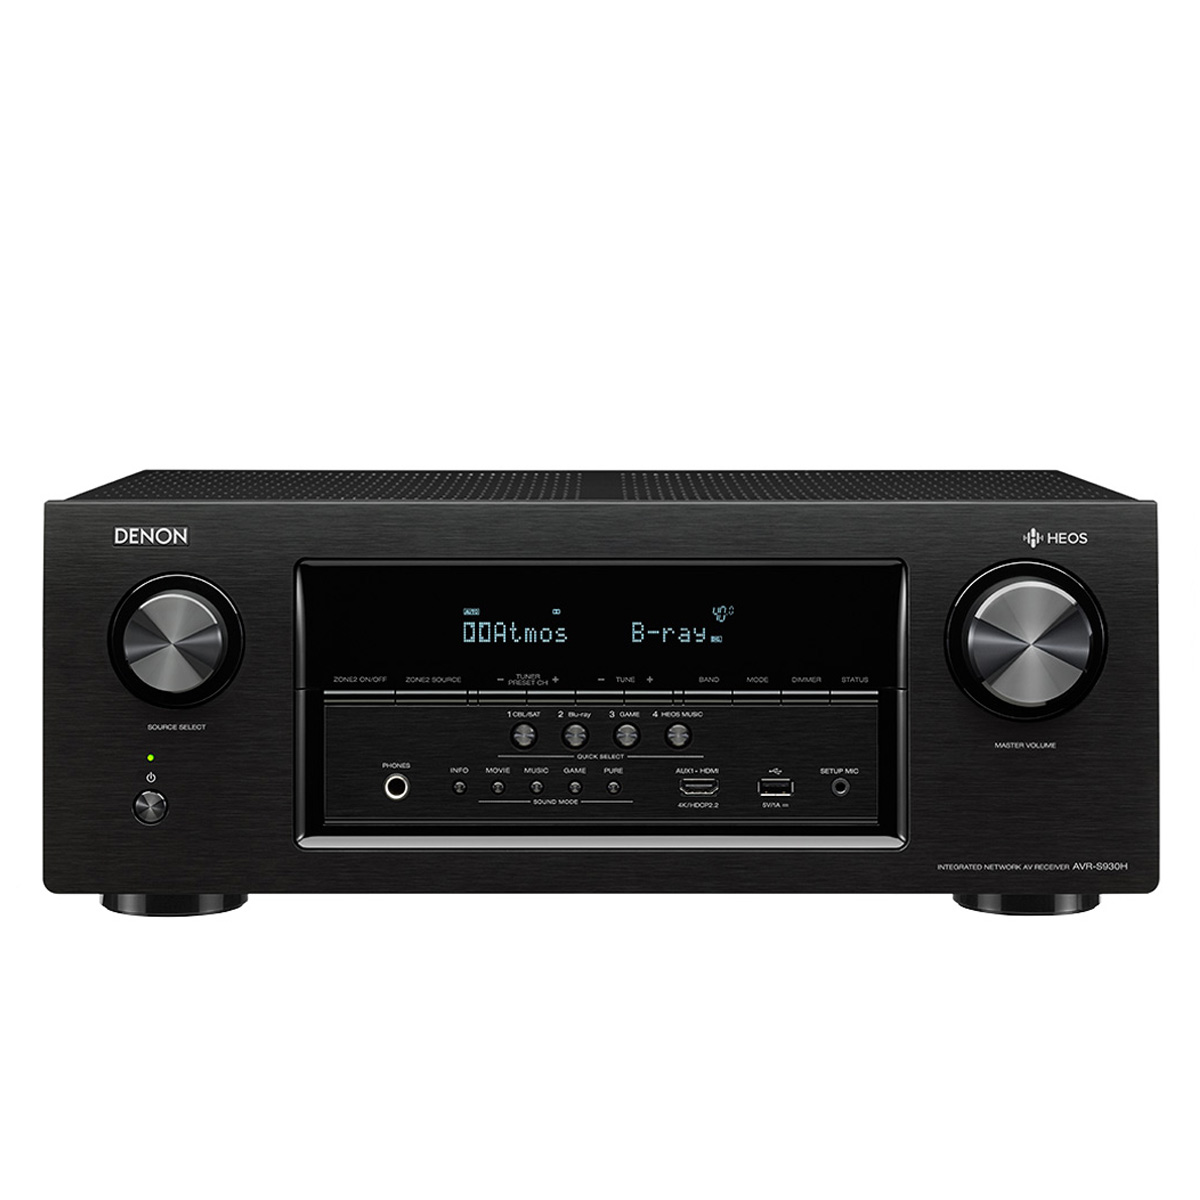 Denon AVRS930H 1295W 7.2-Ch. Hi-Res With HEOS 4K Ultra HD A/V Home Theater Receiver Black